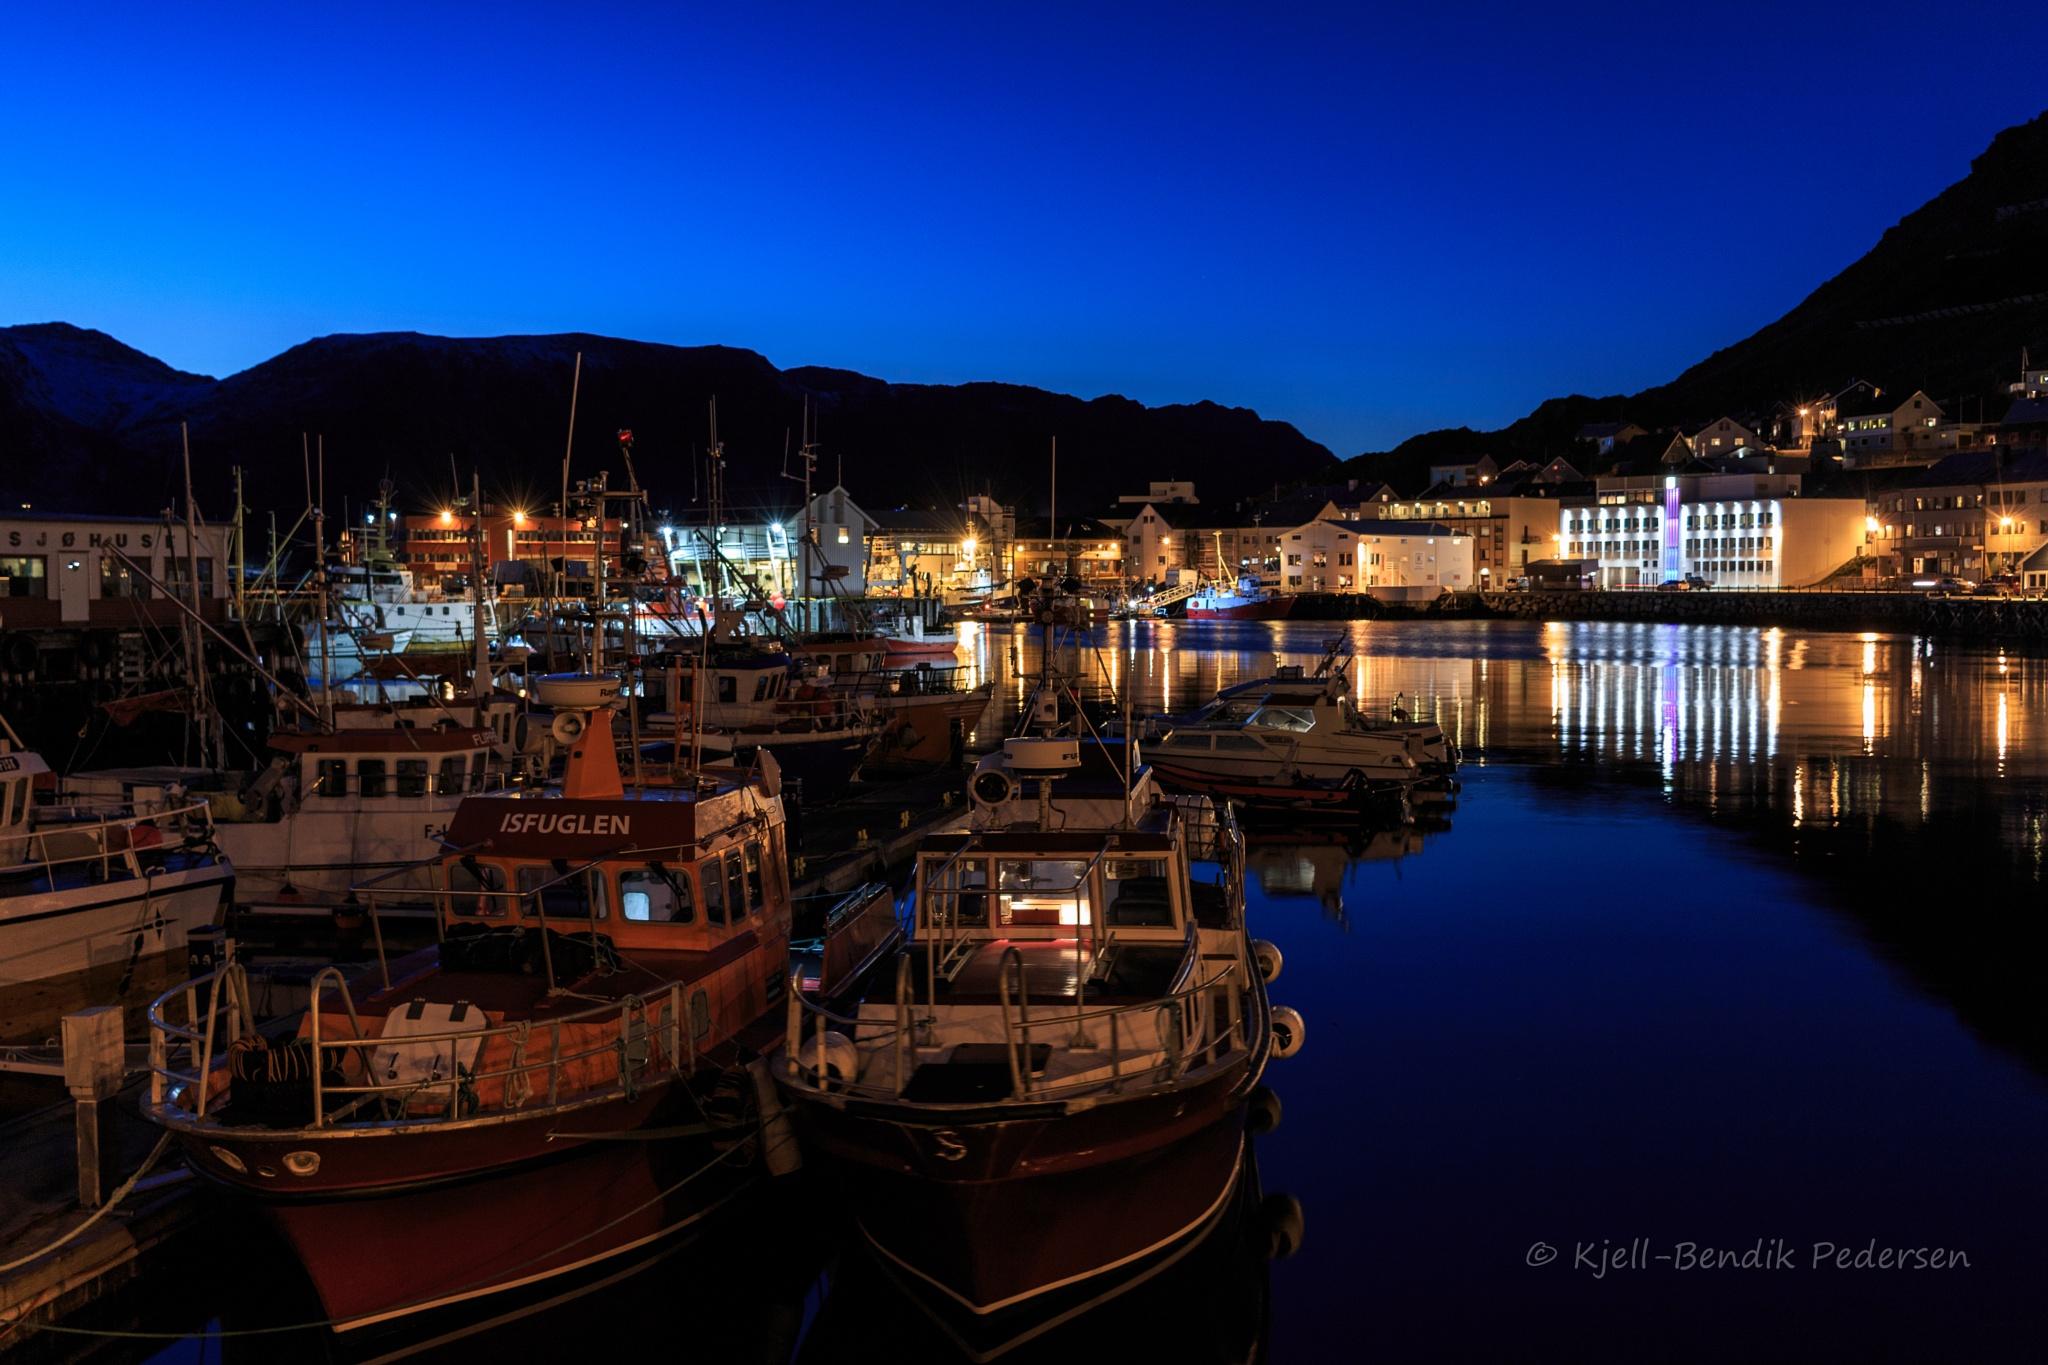 blue hour in the harbor by kjellbendik